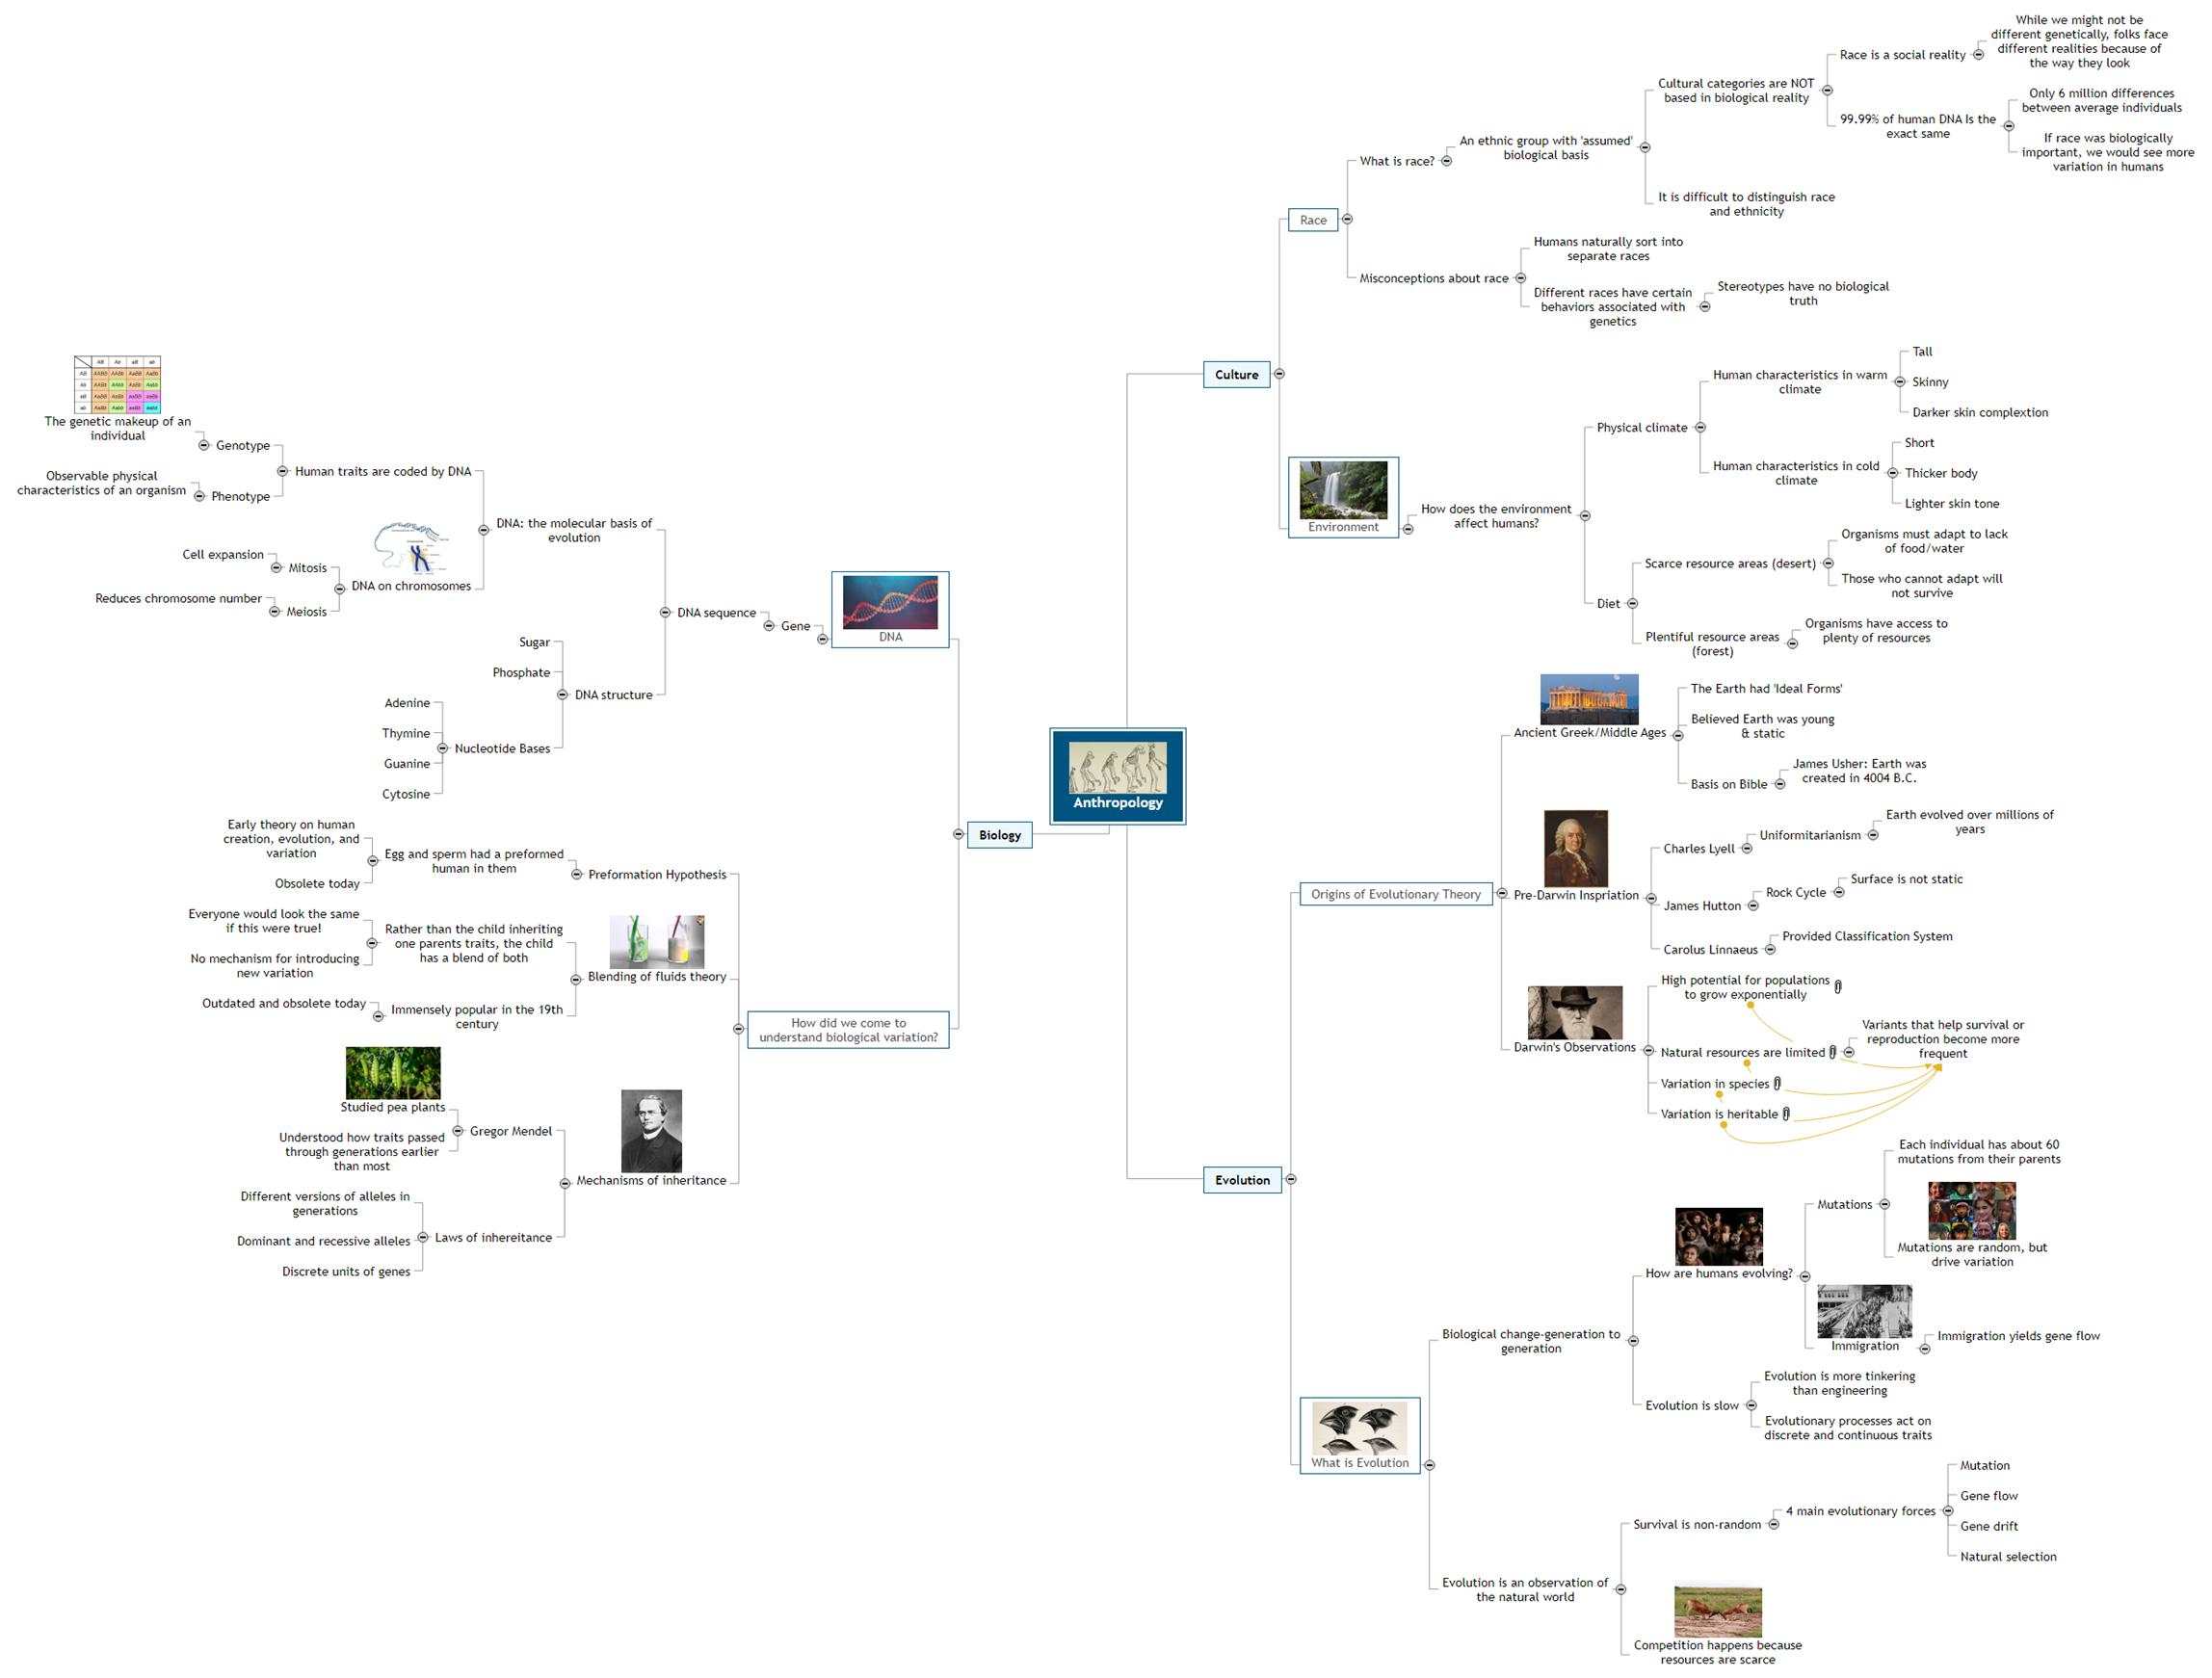 Anthropology Mind Map